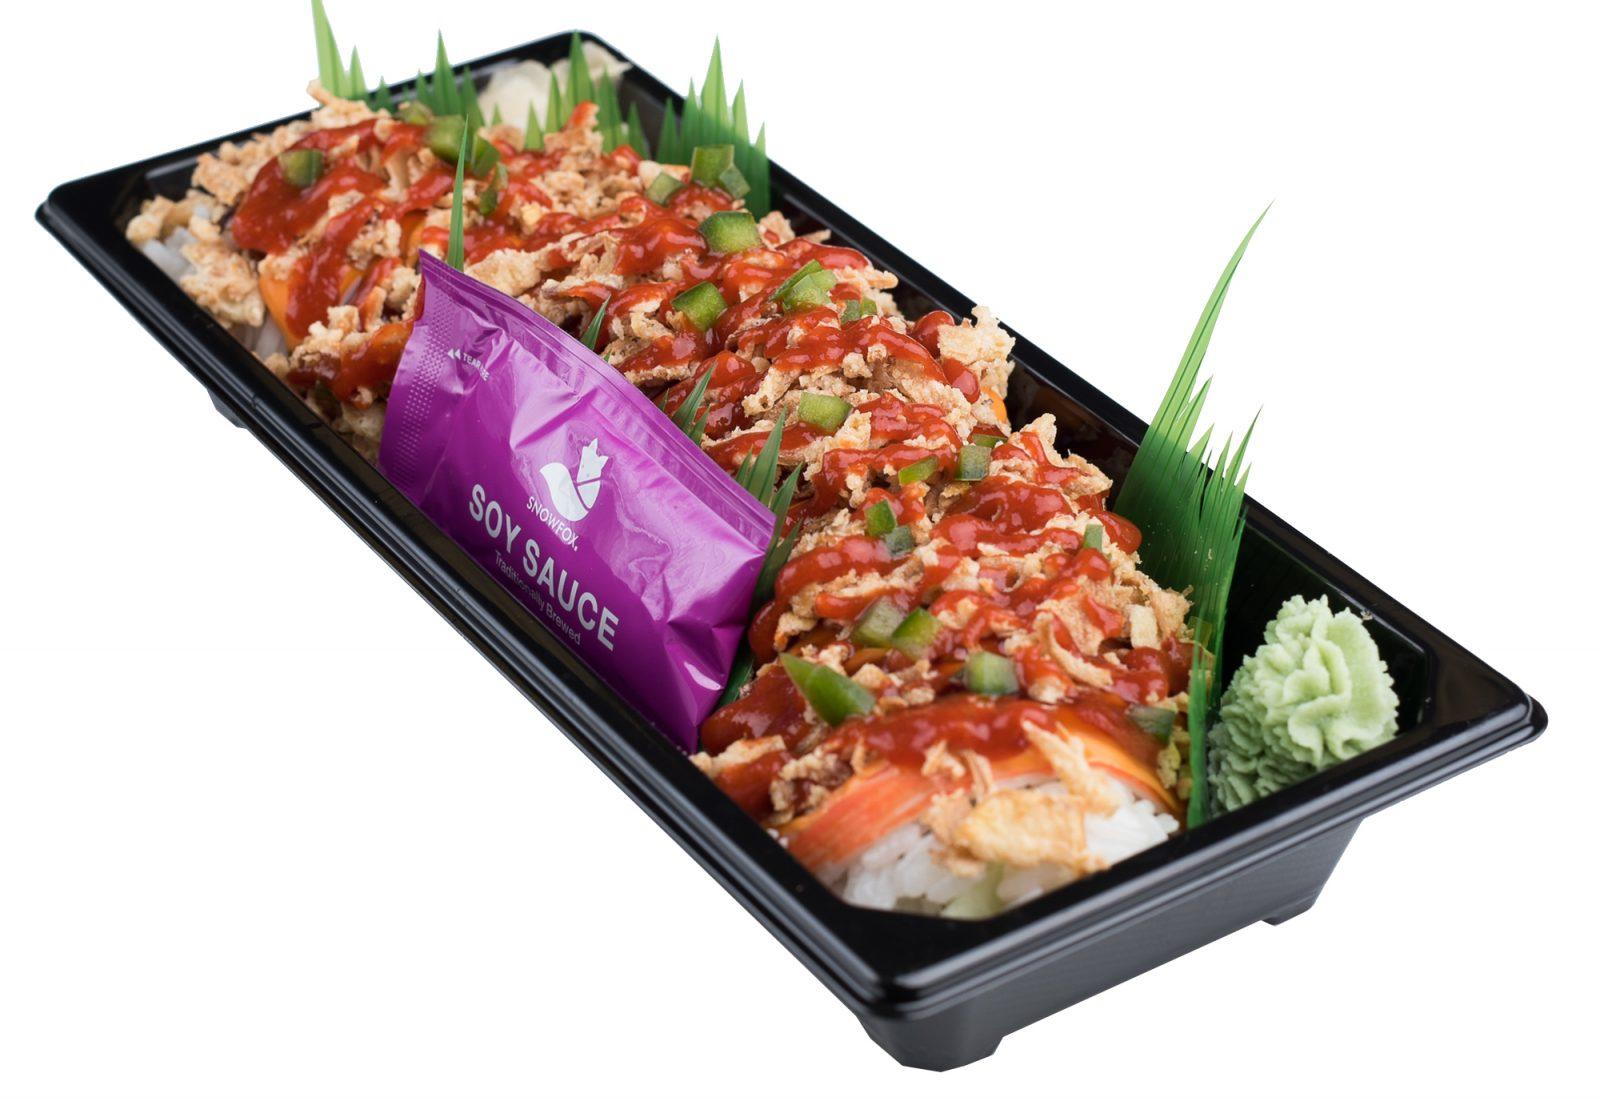 Spicy Crunch Roll